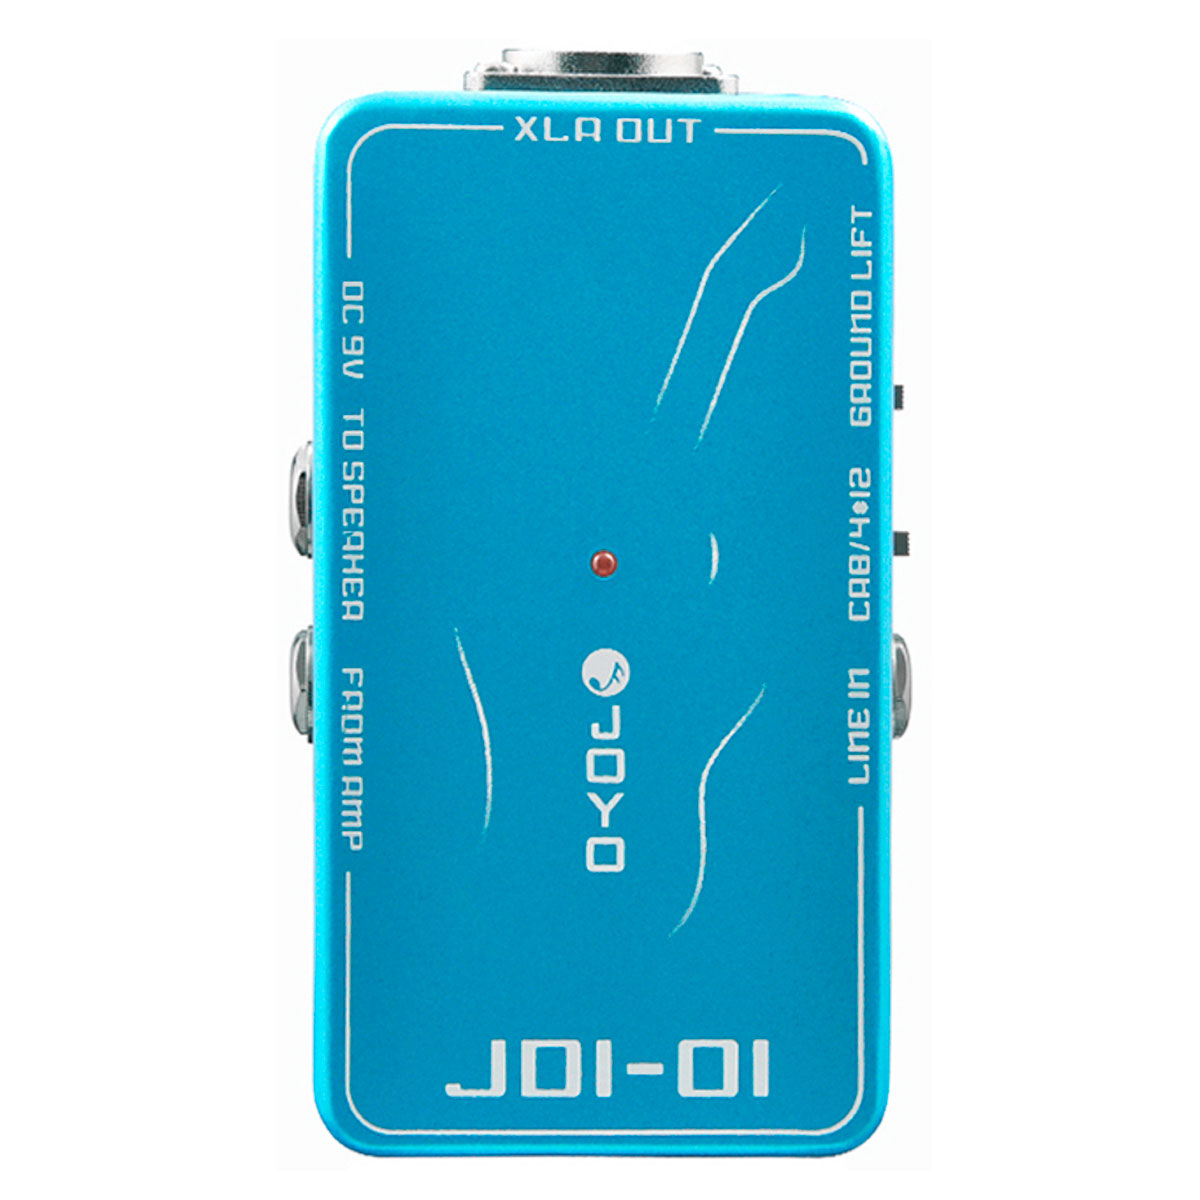 JDI01 - Direct Box Passivo JDI 01 - JOYO